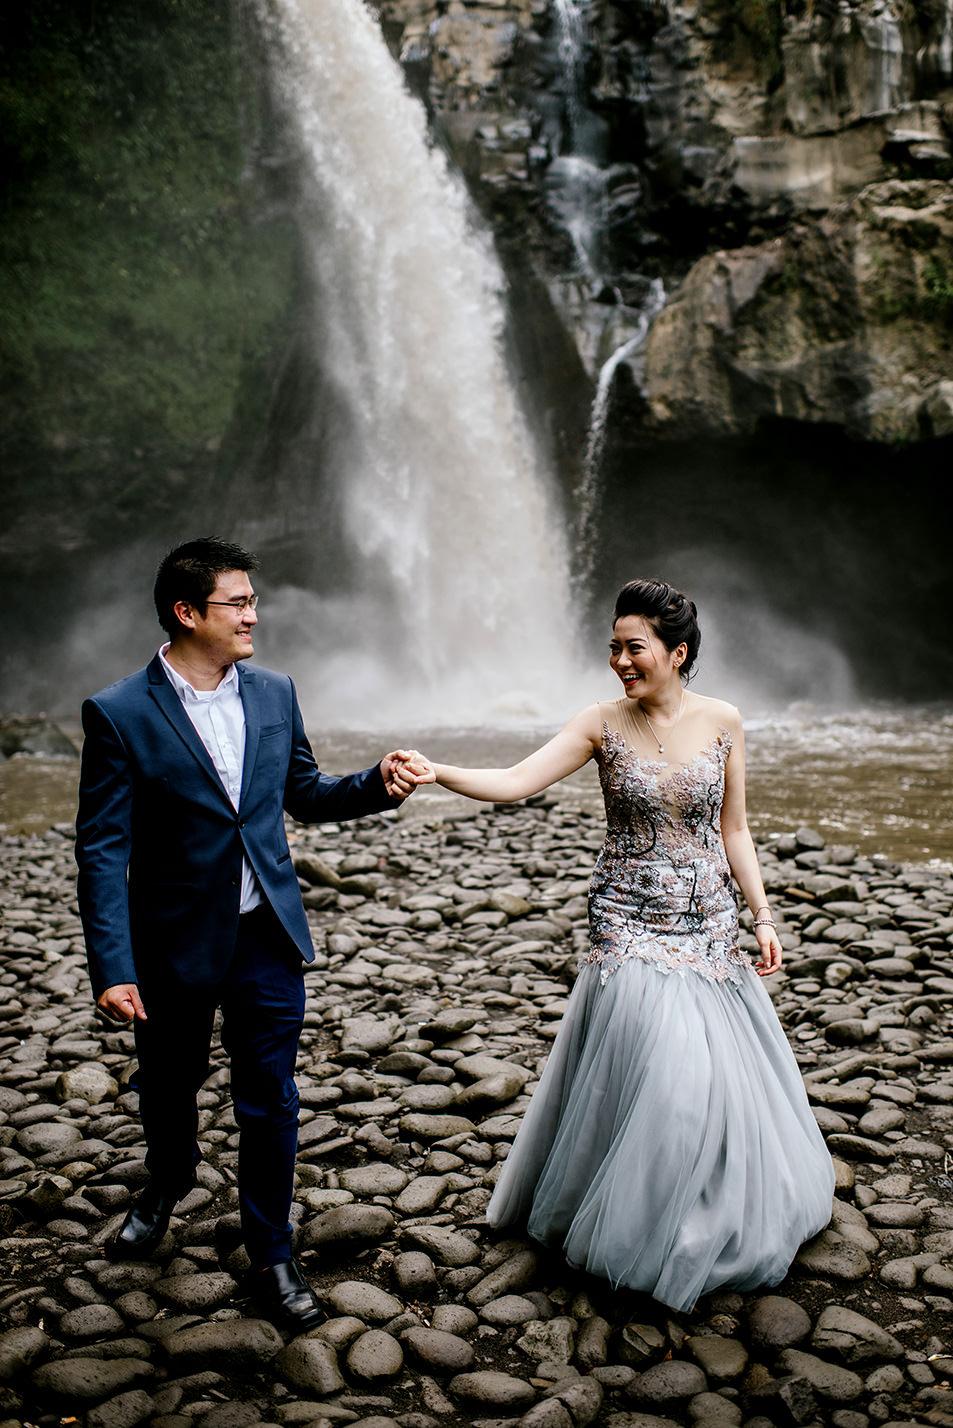 Bali-waterfall-engagment-Bali-wedding-photographer05.jpg